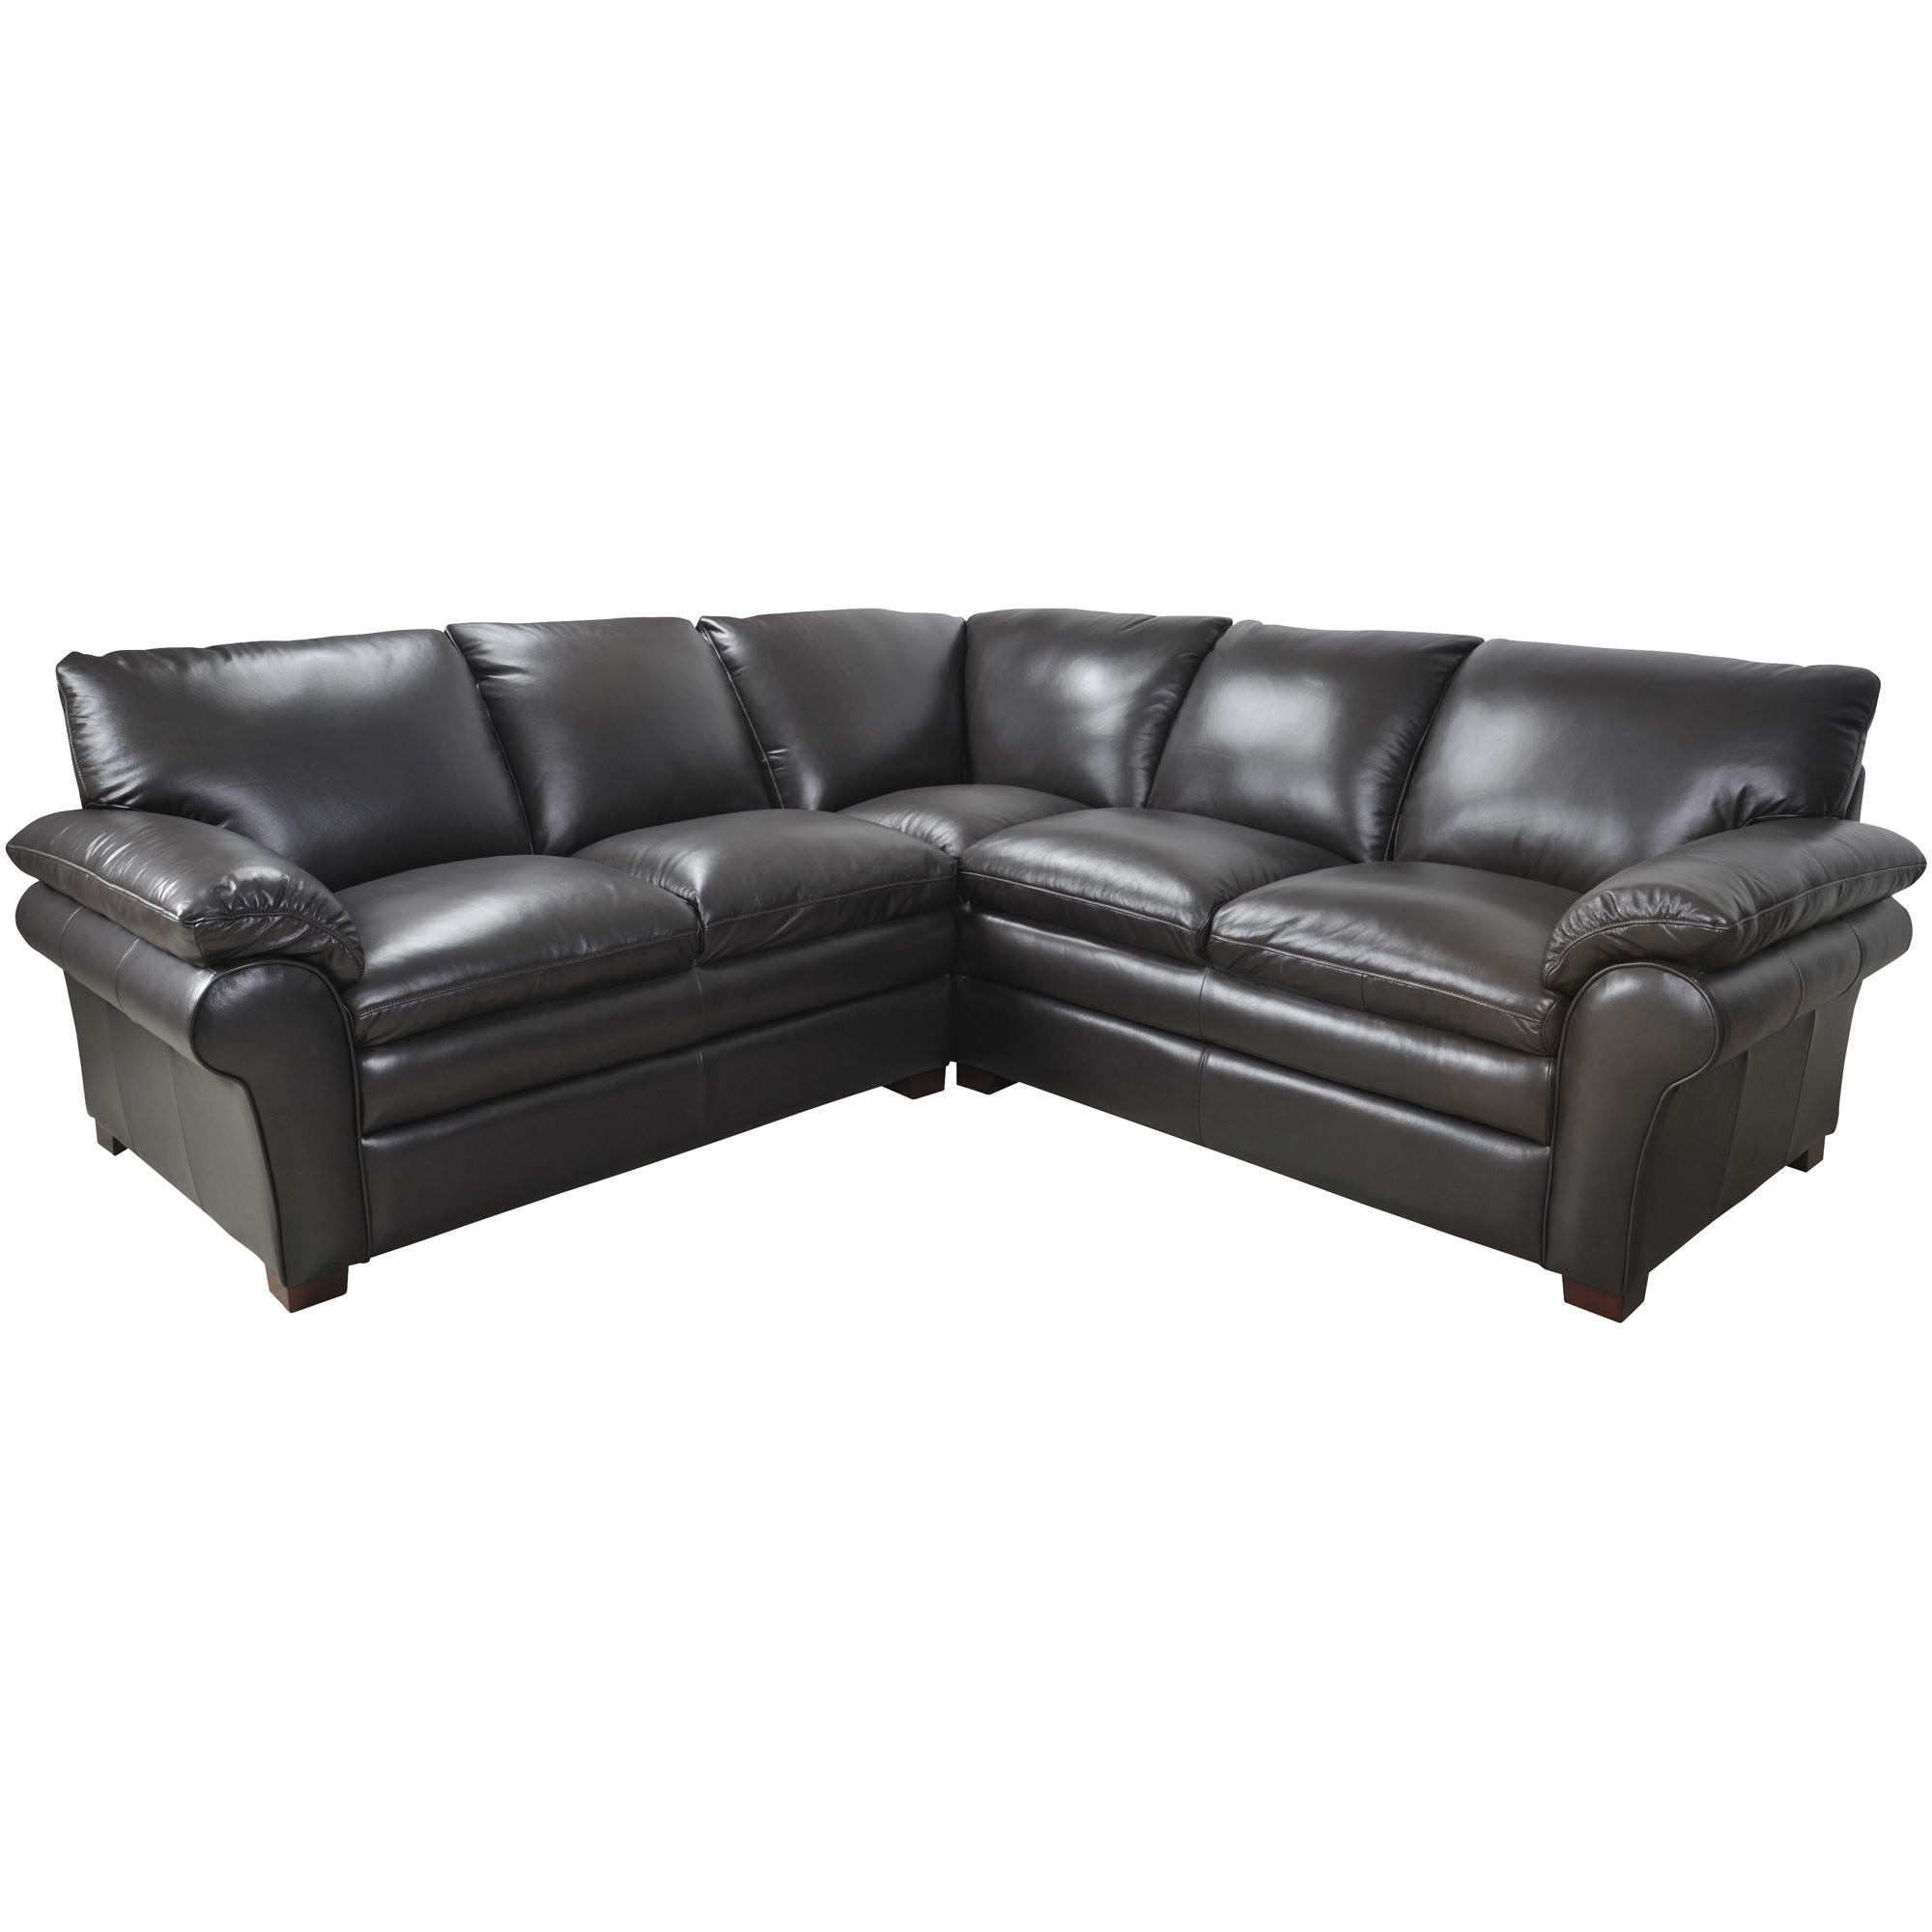 Futura Leather | Moldova Brown Left Arm Loveseat Sectional Sofa